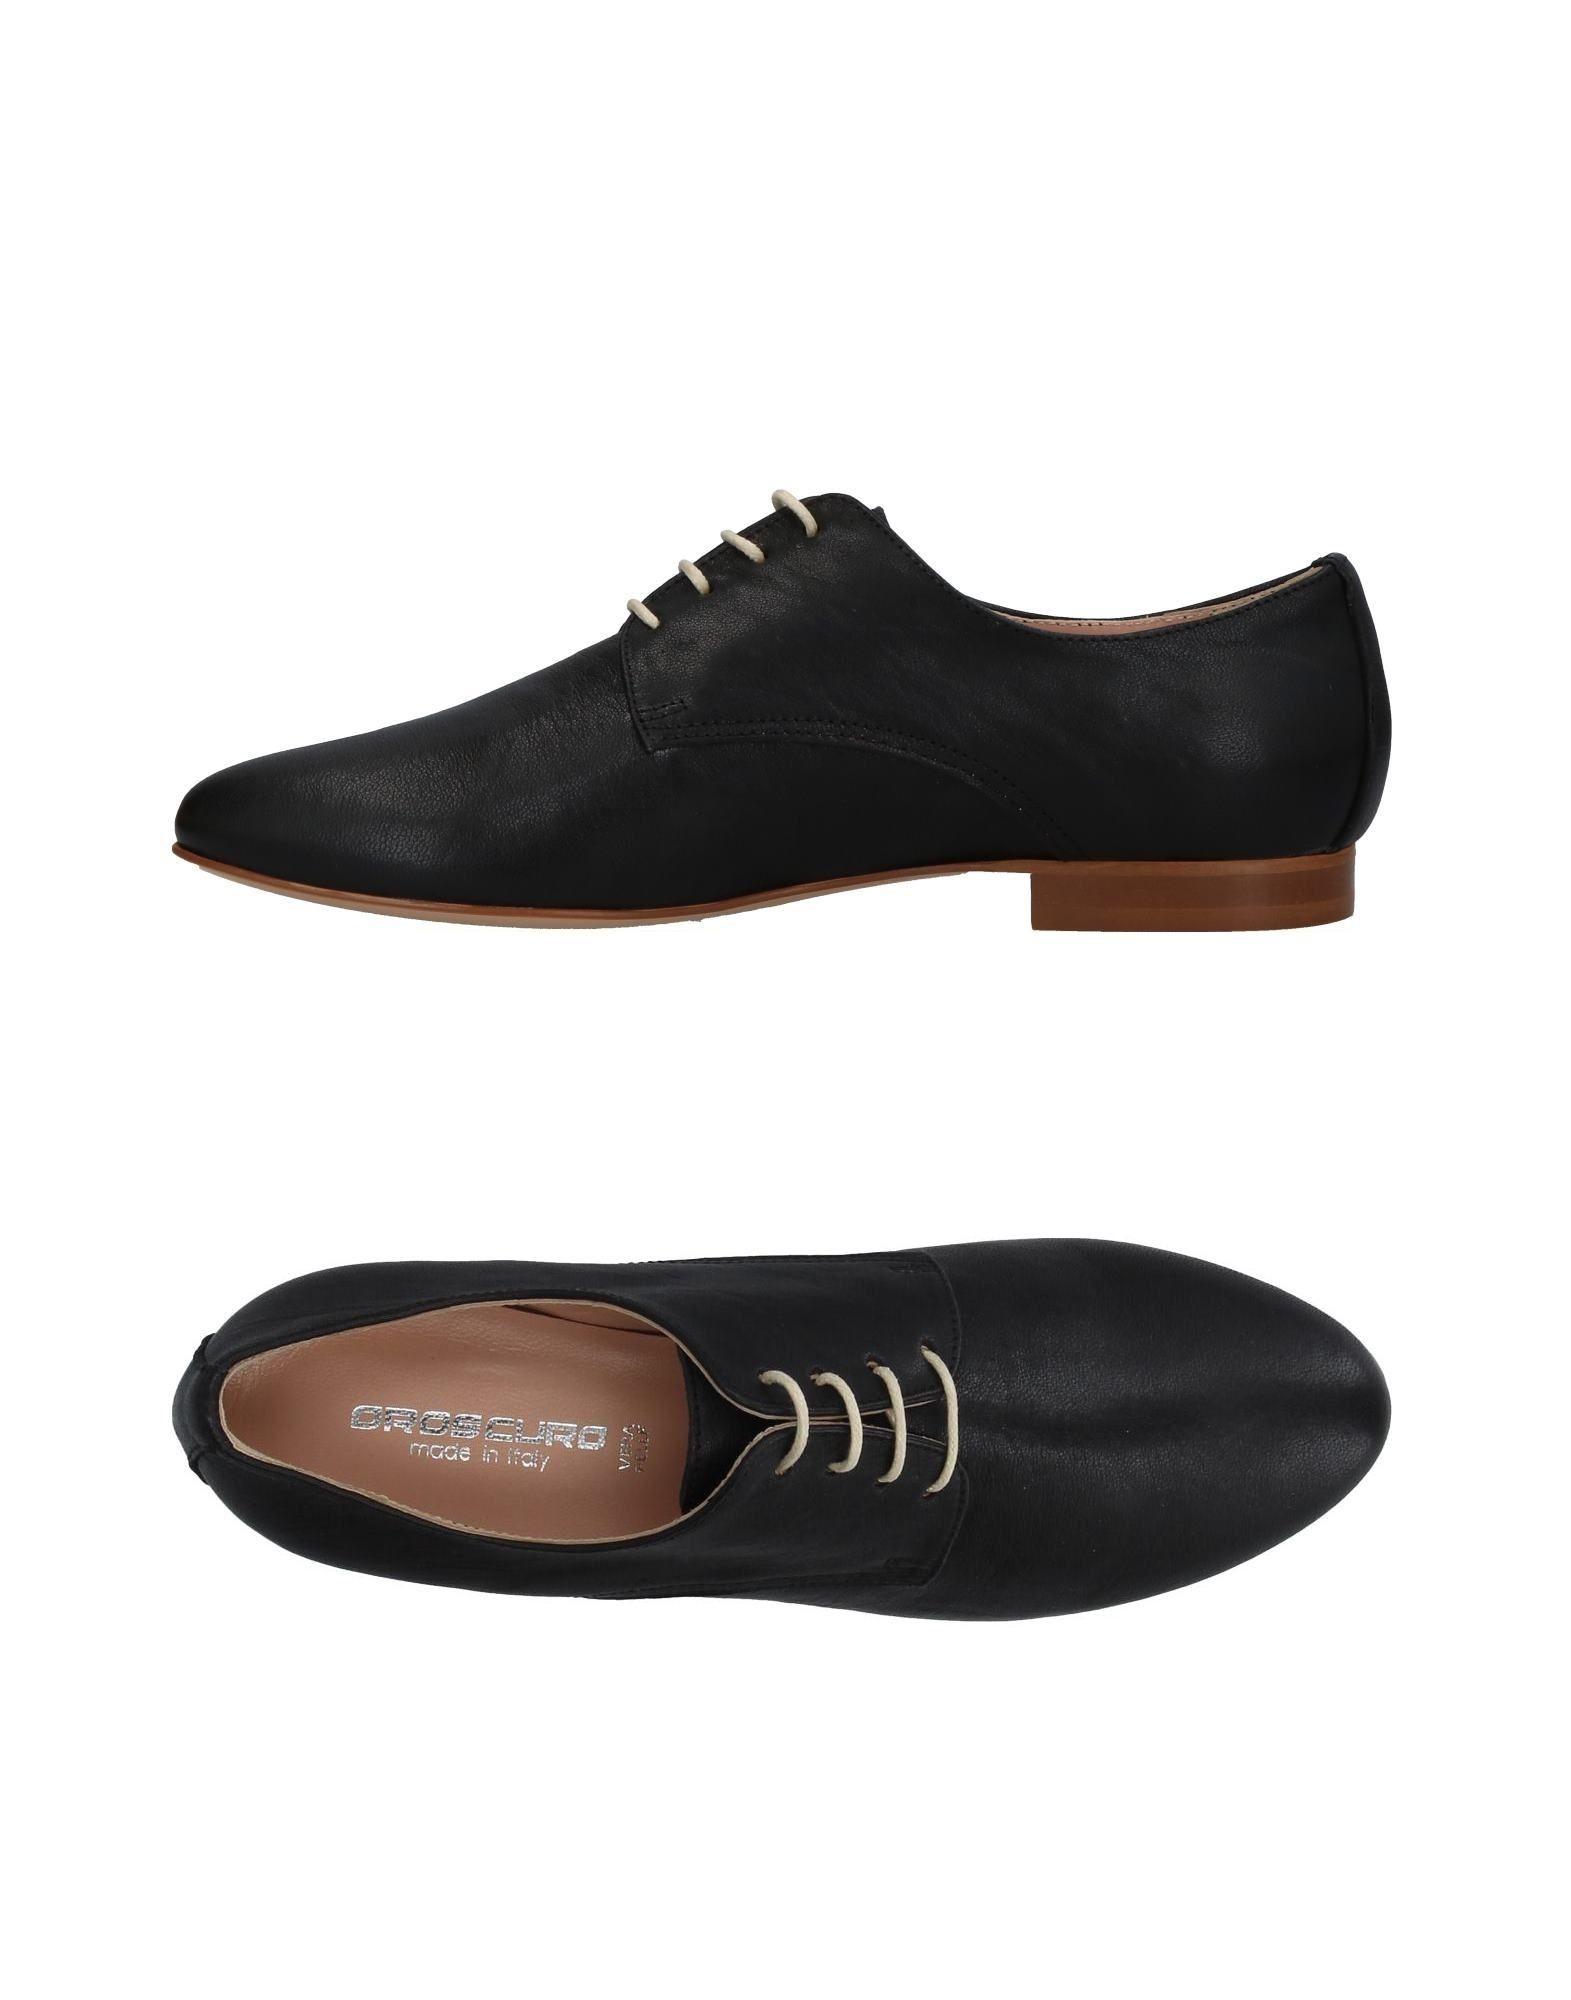 Oroscuro Schnürschuhe Damen  11376747CU Gute Qualität beliebte Schuhe